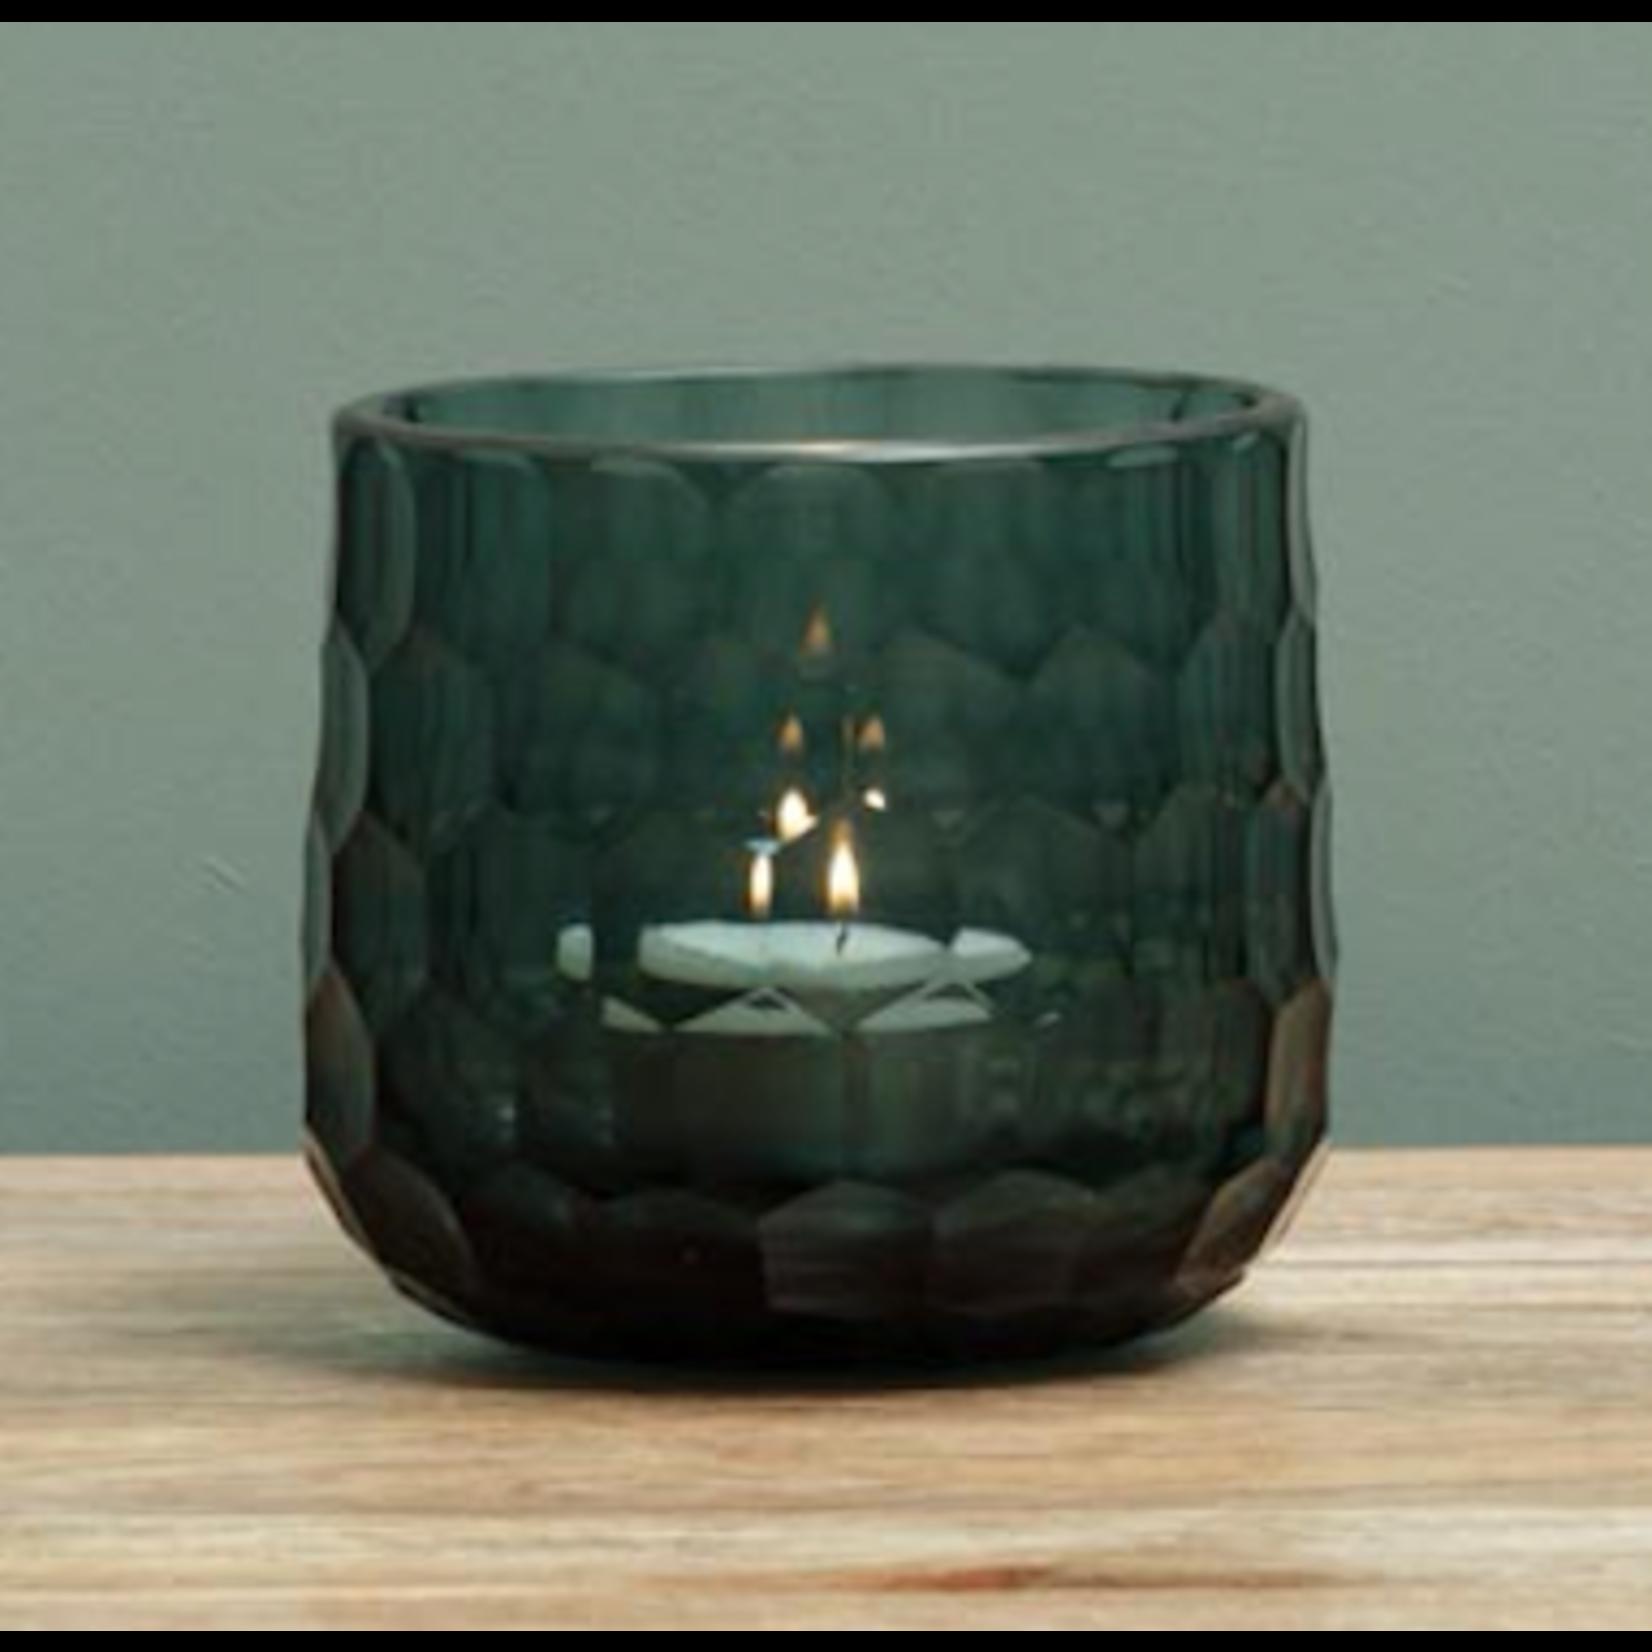 CHEHOMA BLUE THICK GLASS CANDLEHOLDER HONEYCO